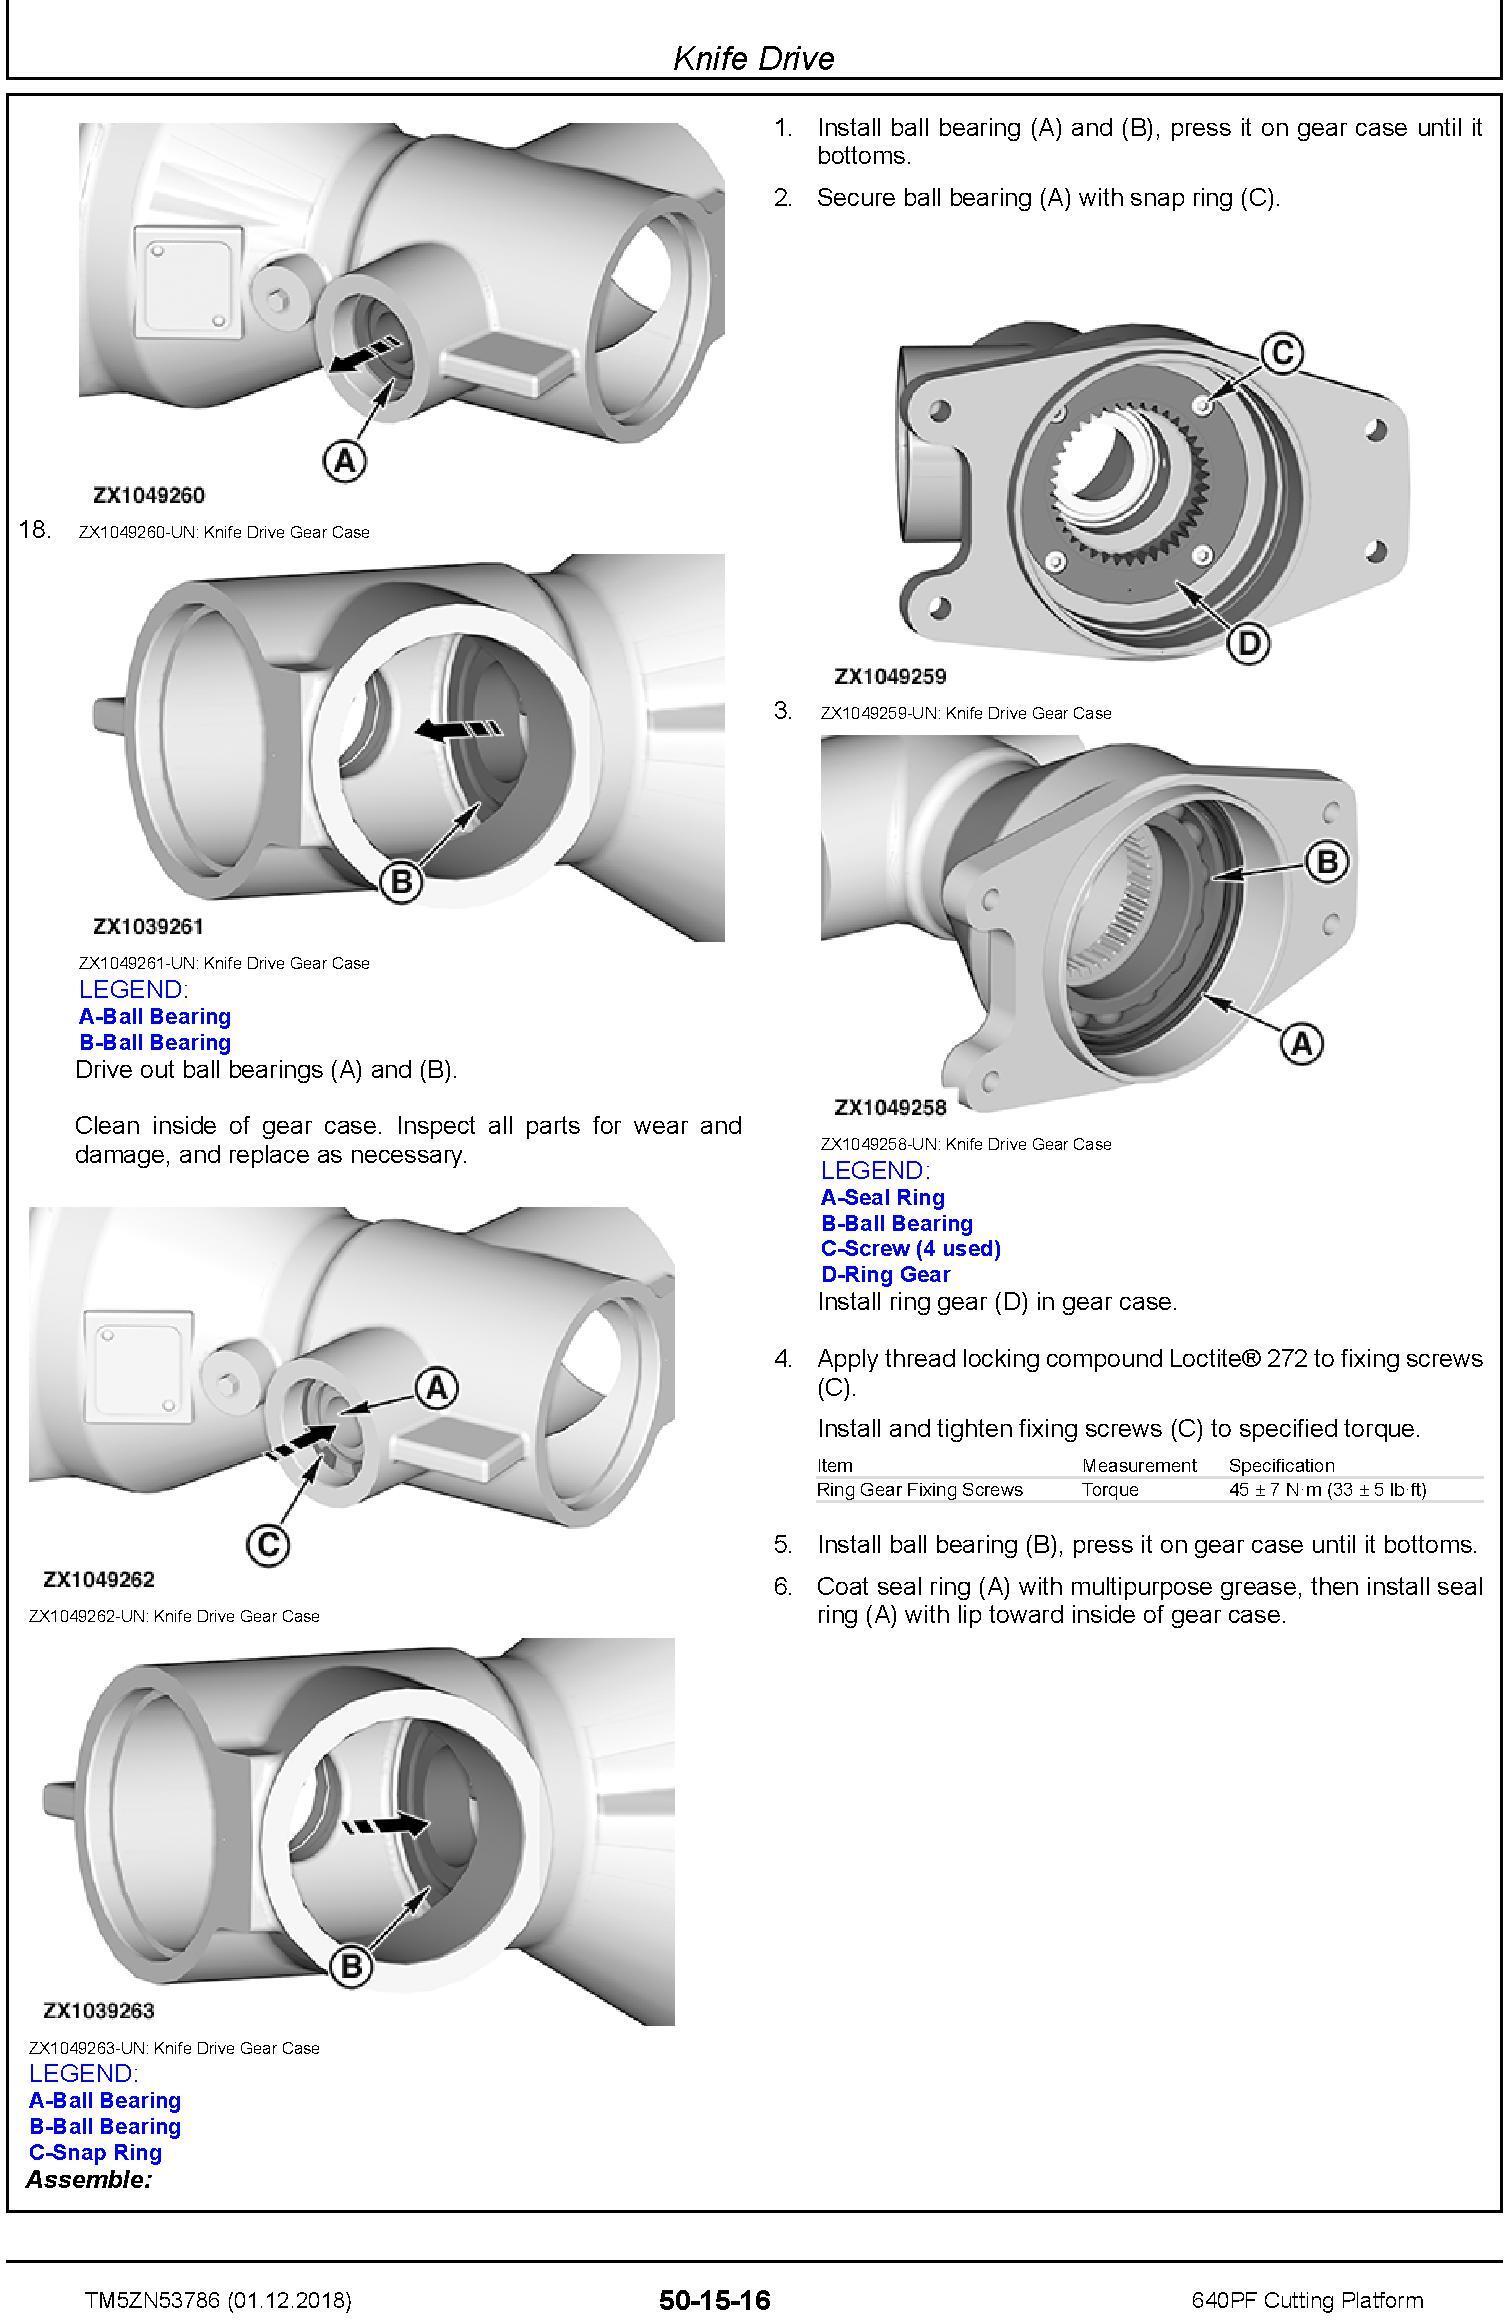 John Deere 640PF Cutting Platform Technical Service Manual (TM5ZN53786) - 3